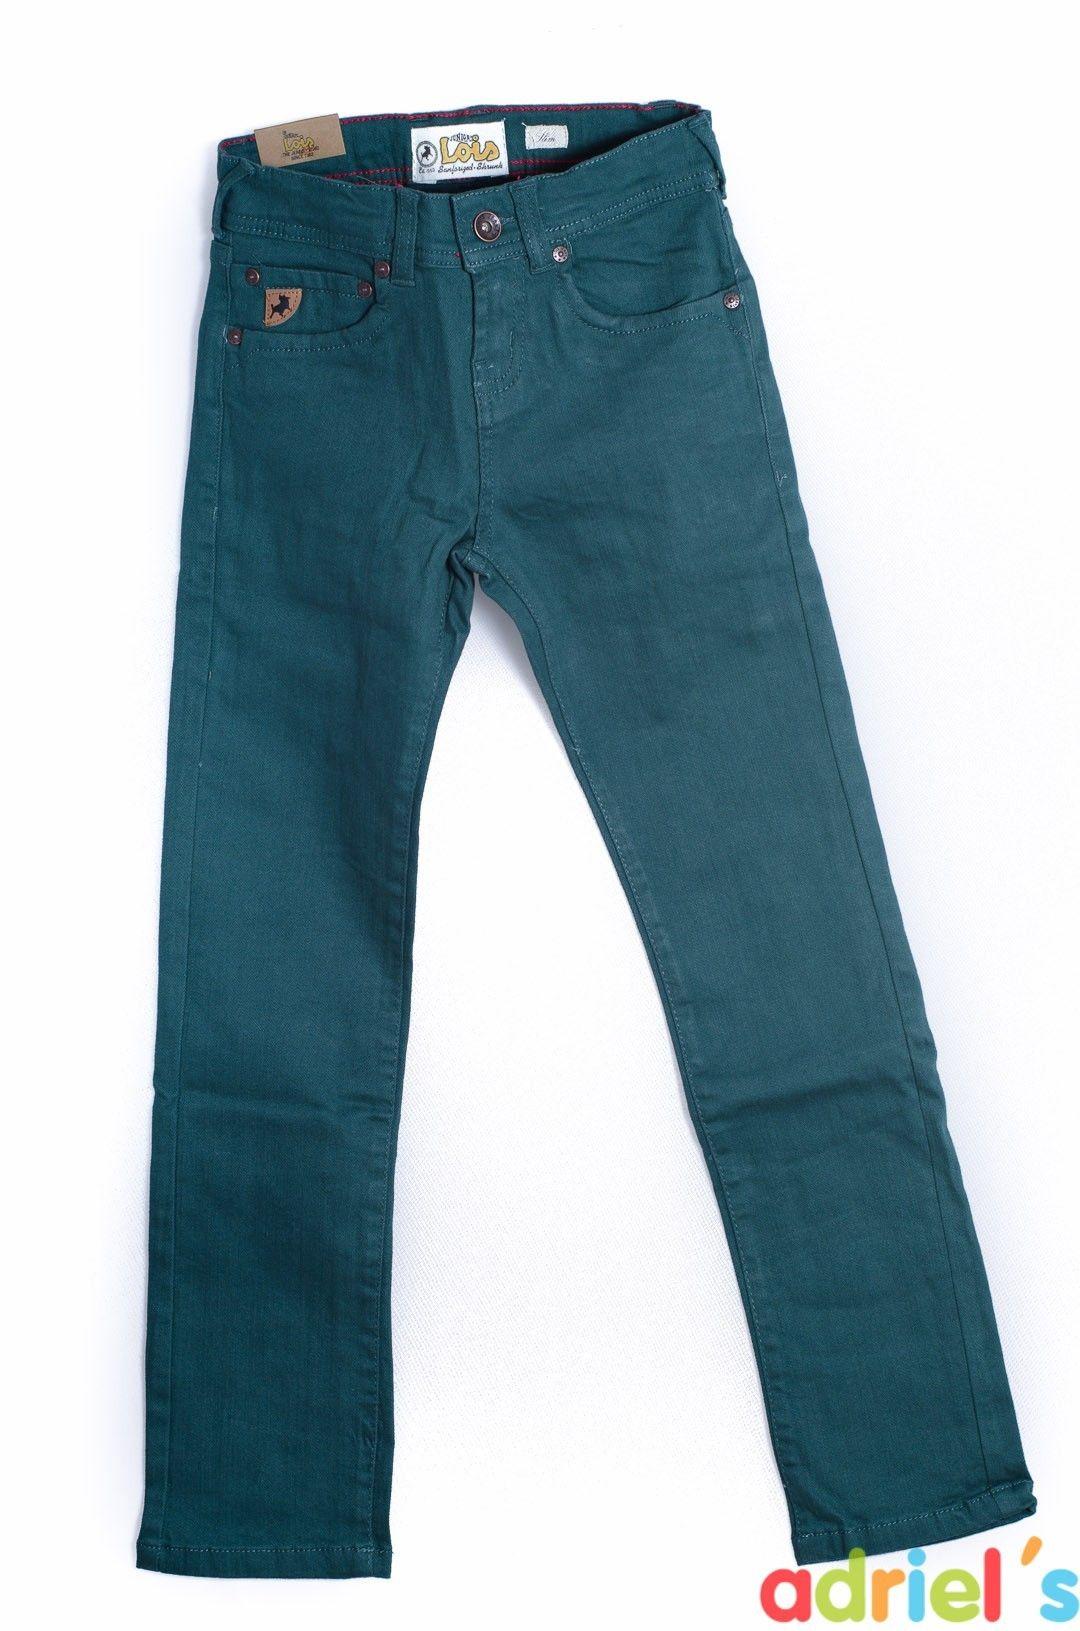 5511ad319 Pantalones color petroleo para niño de Lois Jeans | OUTLET MODA ...